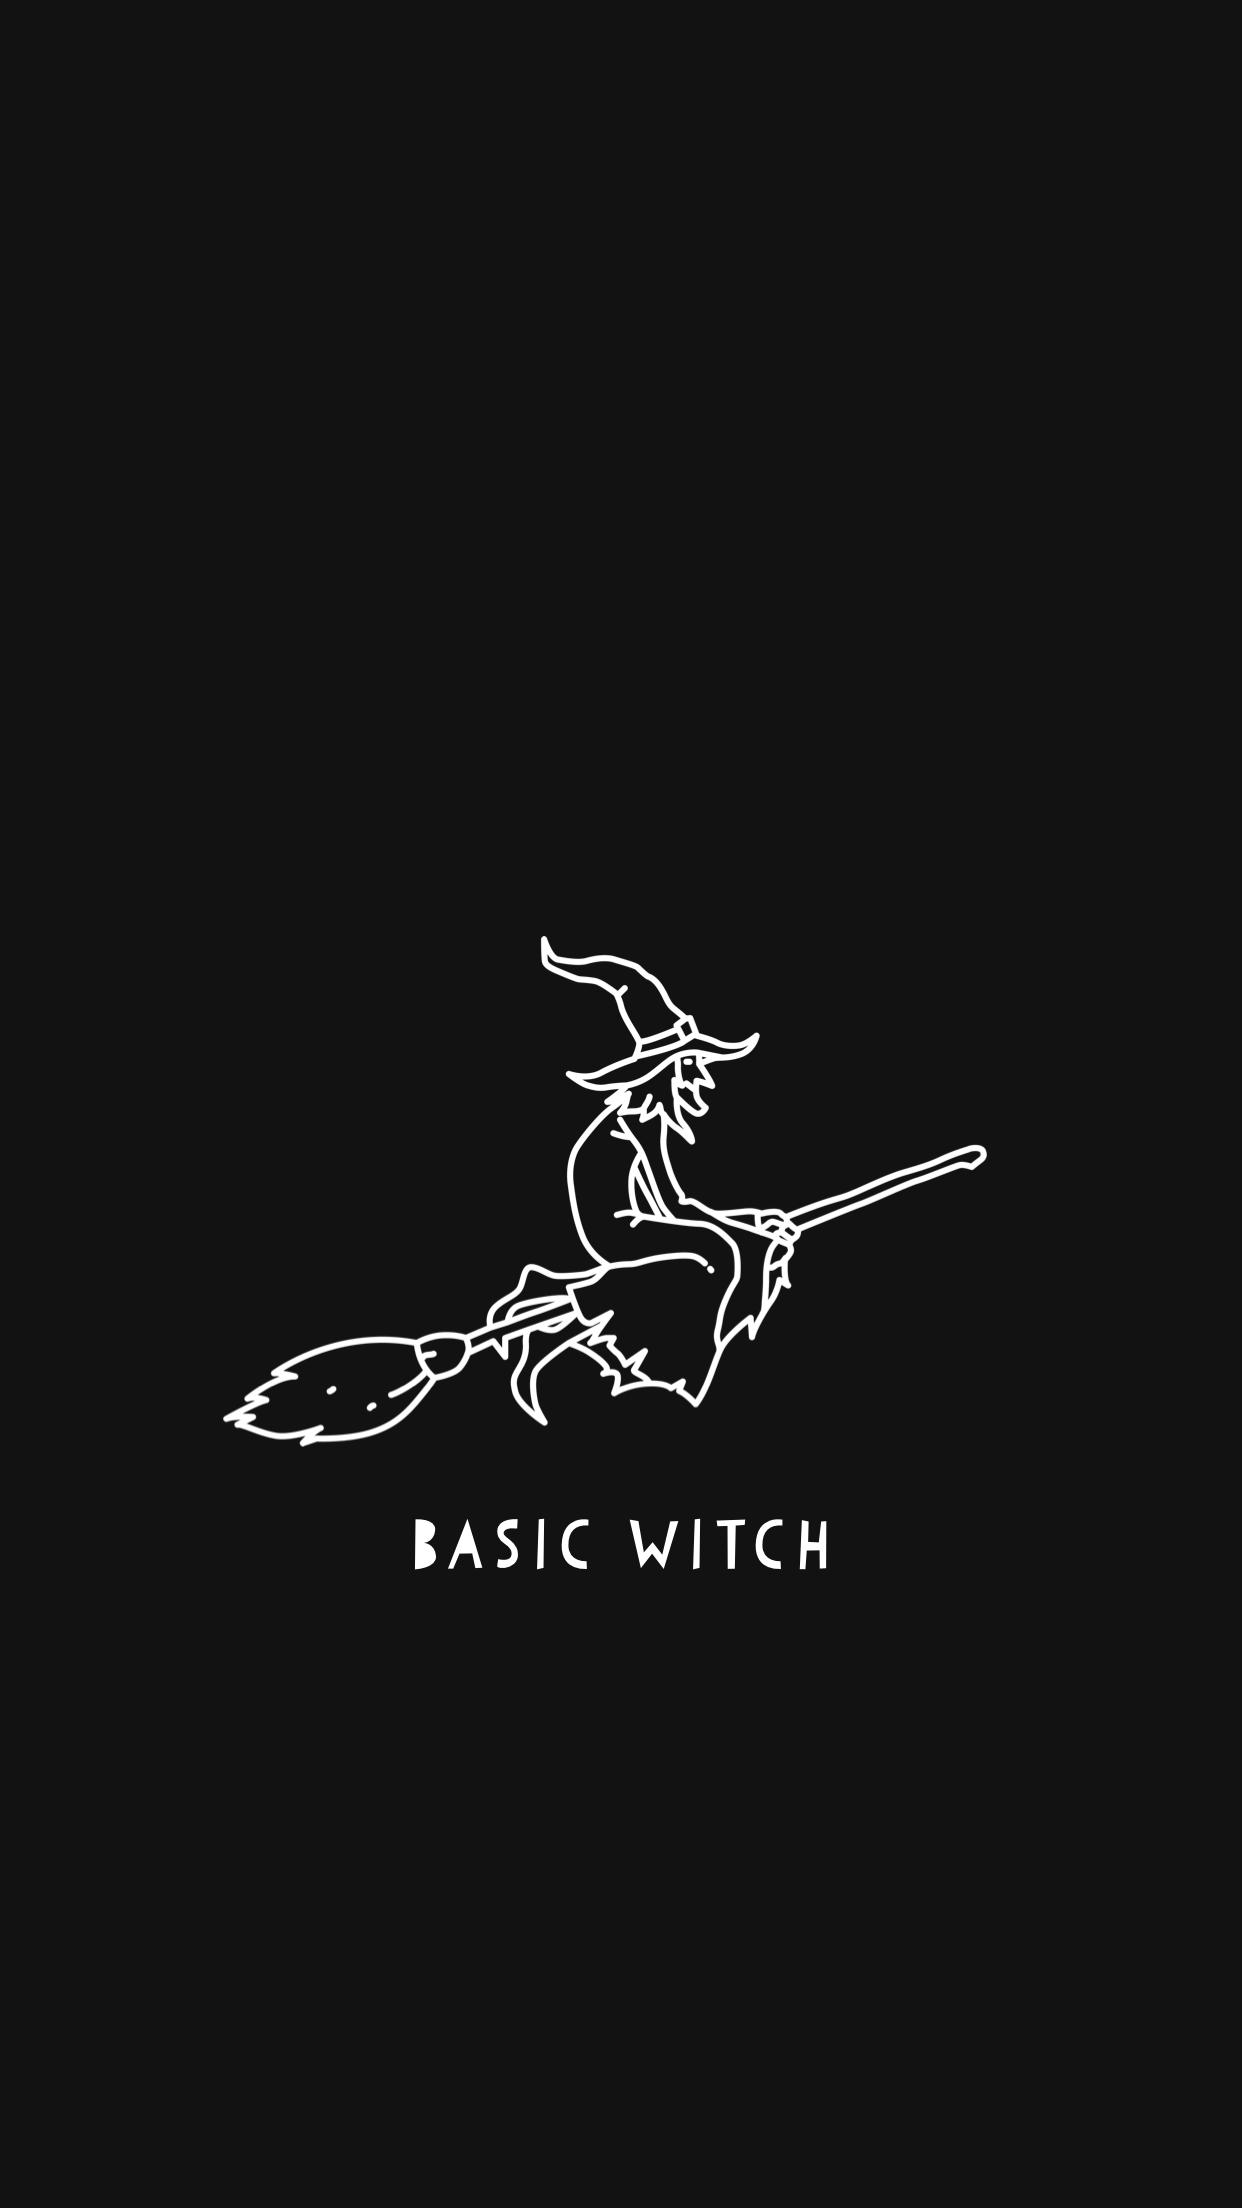 Basic Witch Arvo Wallpaper Be Good Do Good Arvo Arvowear Arvowatch Watches Backgro Halloween Wallpaper Iphone Witchy Wallpaper Halloween Wallpaper